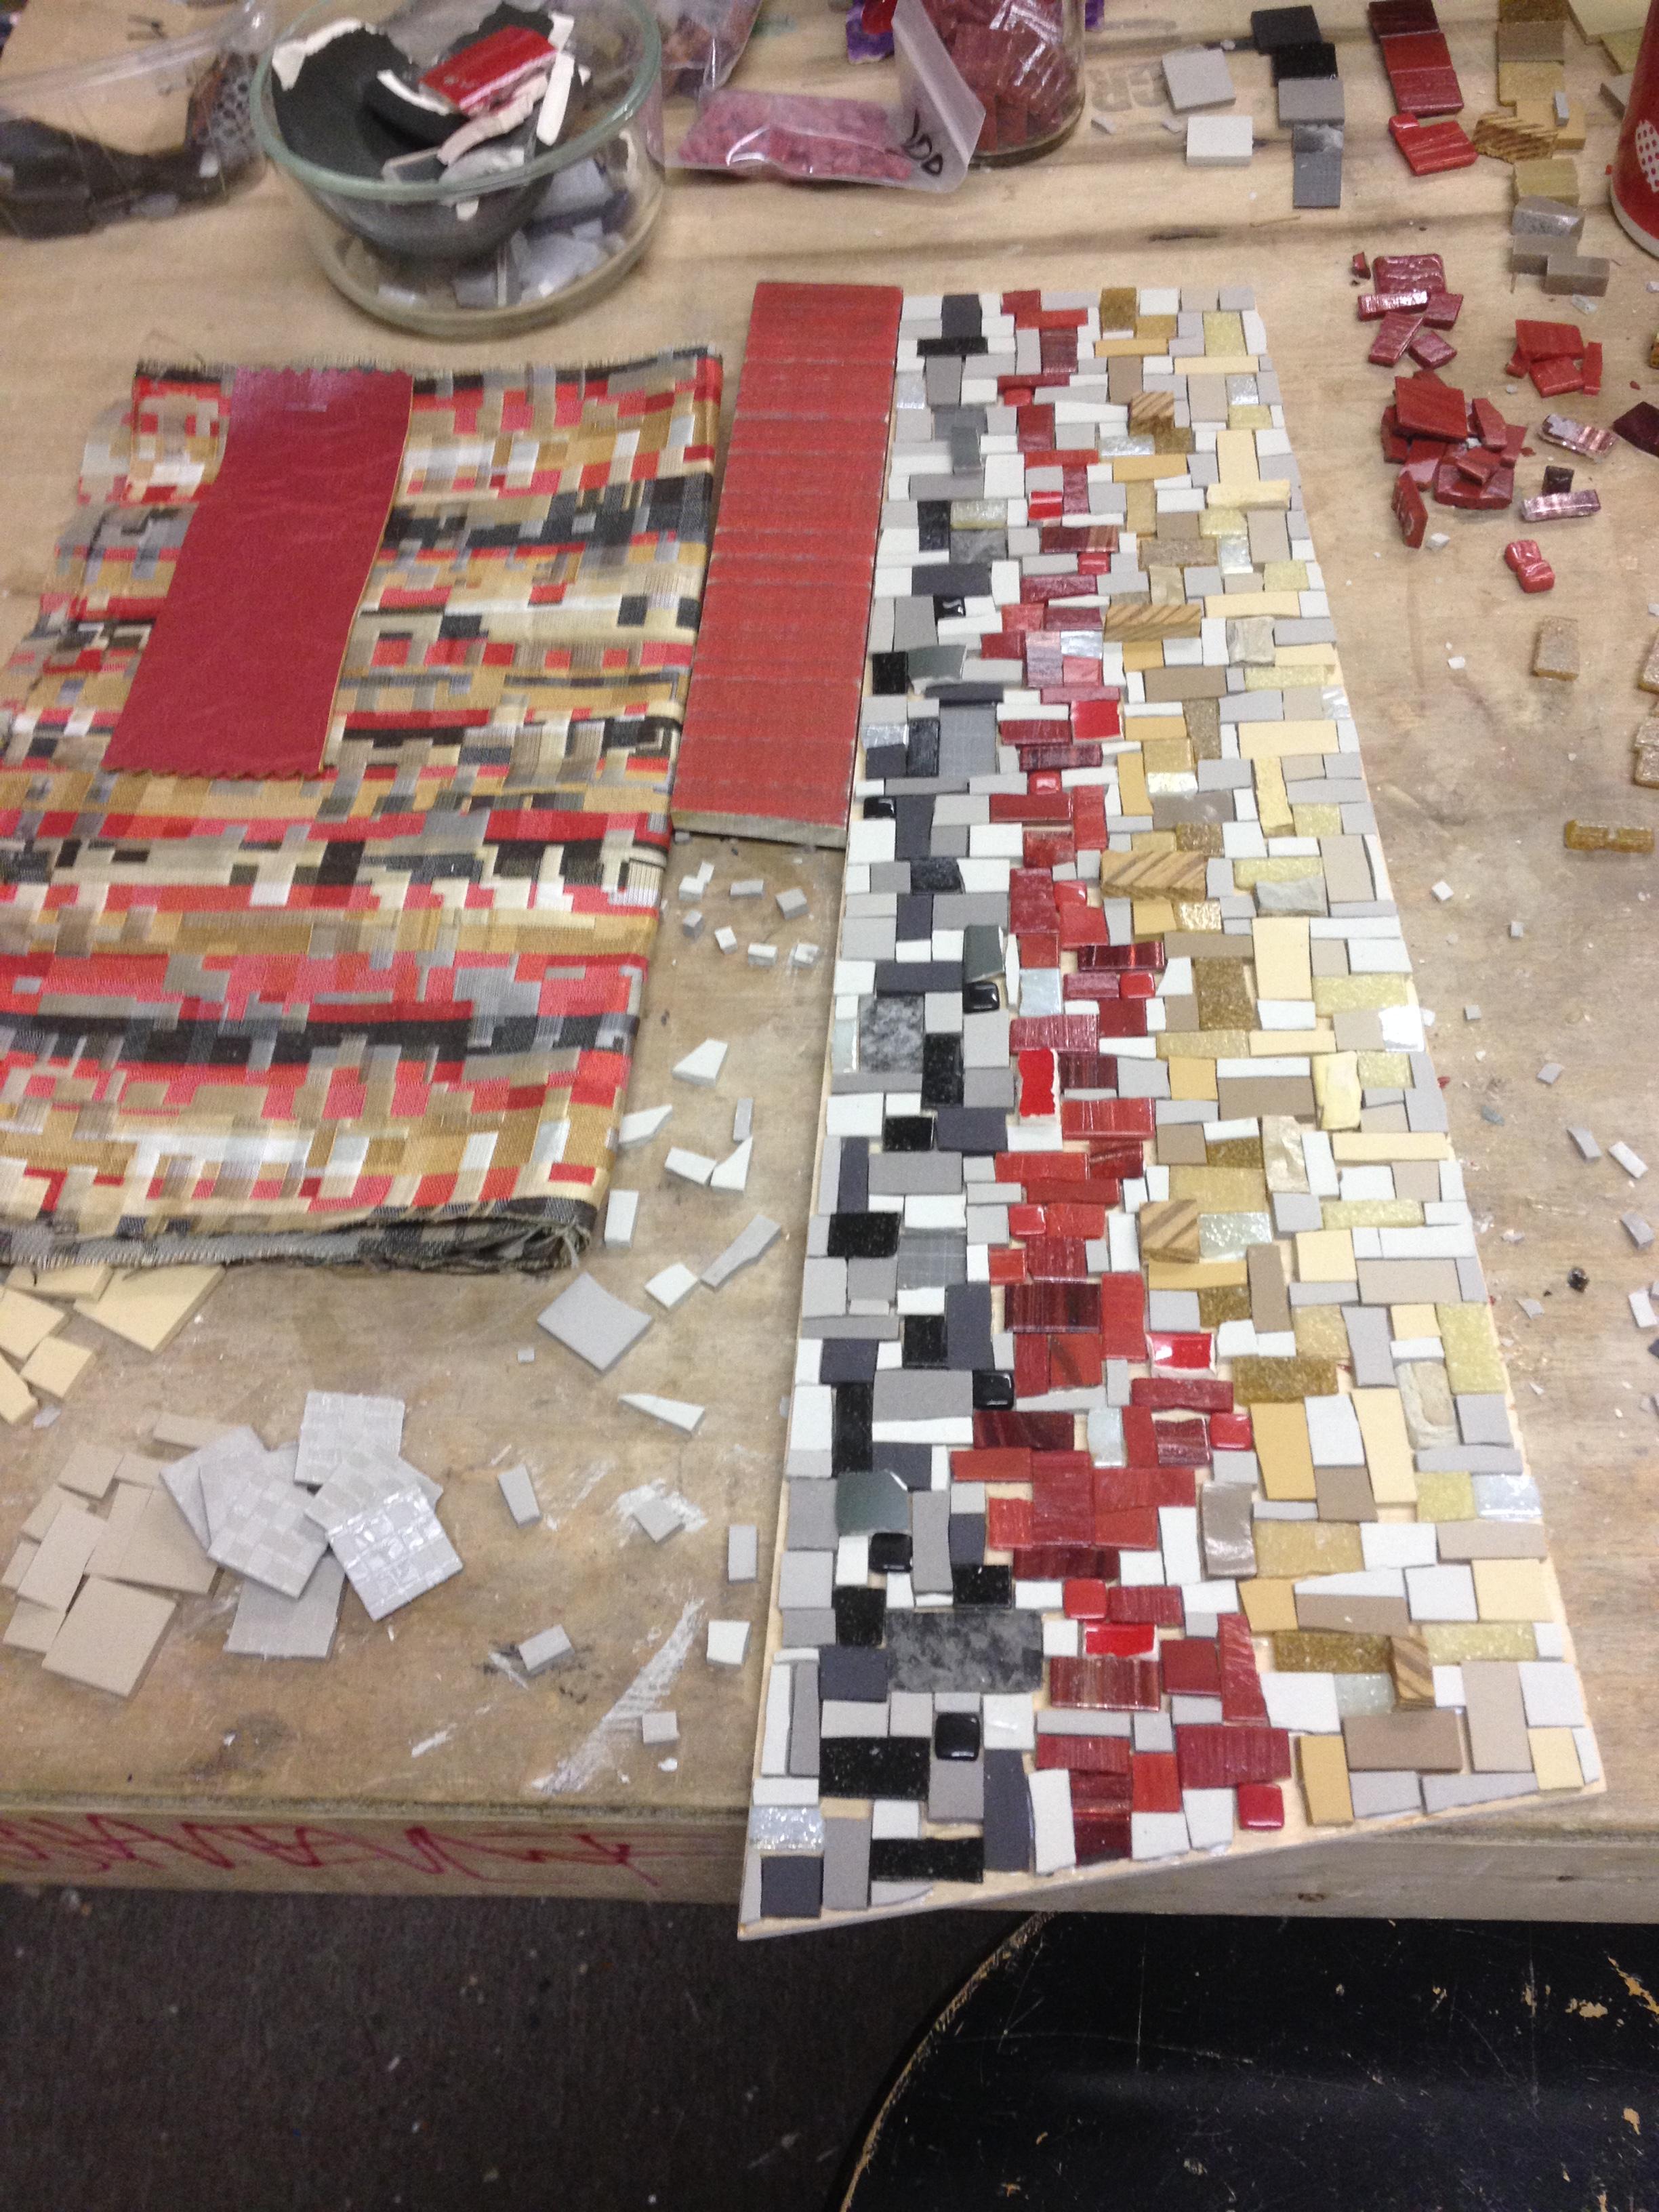 Wall-sculpture-collaboration-mosaic-PH2014.JPG